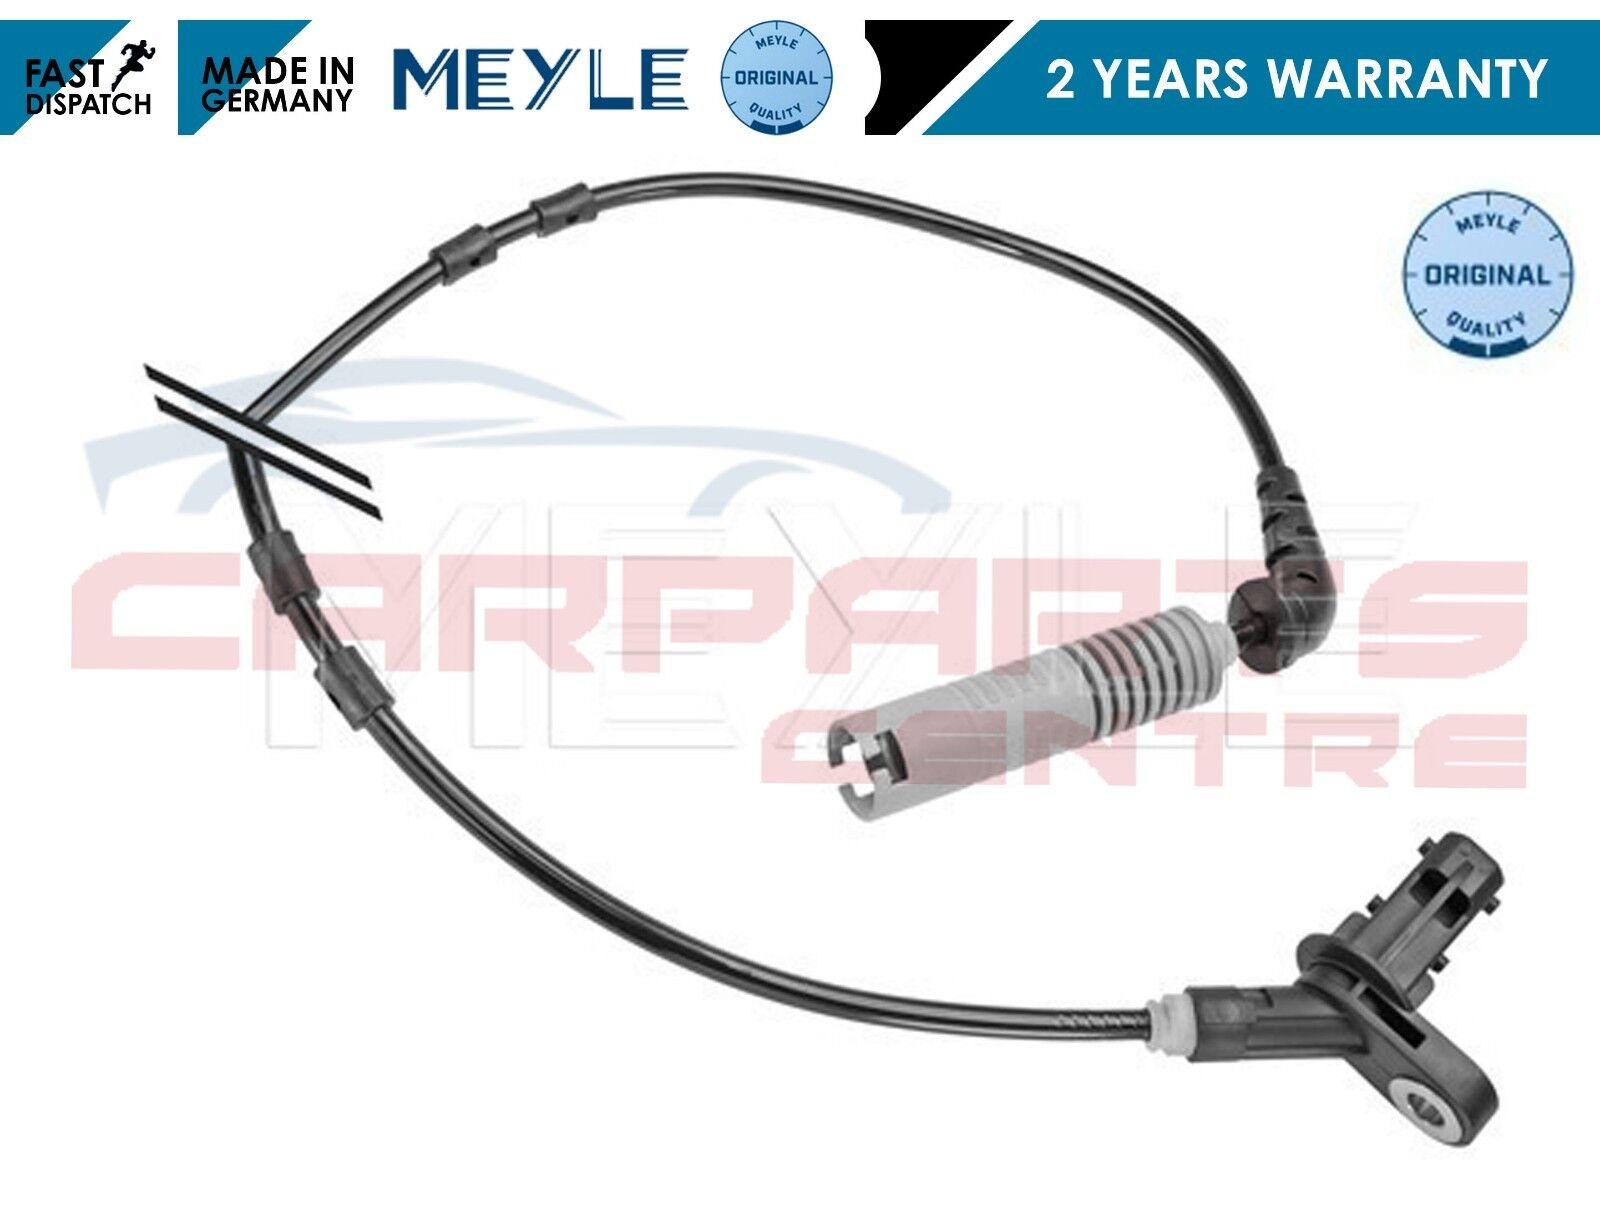 Fits BMW 3 Series E46 330 Ci Genuine Lemark Front Left ABS Wheel Speed Sensor